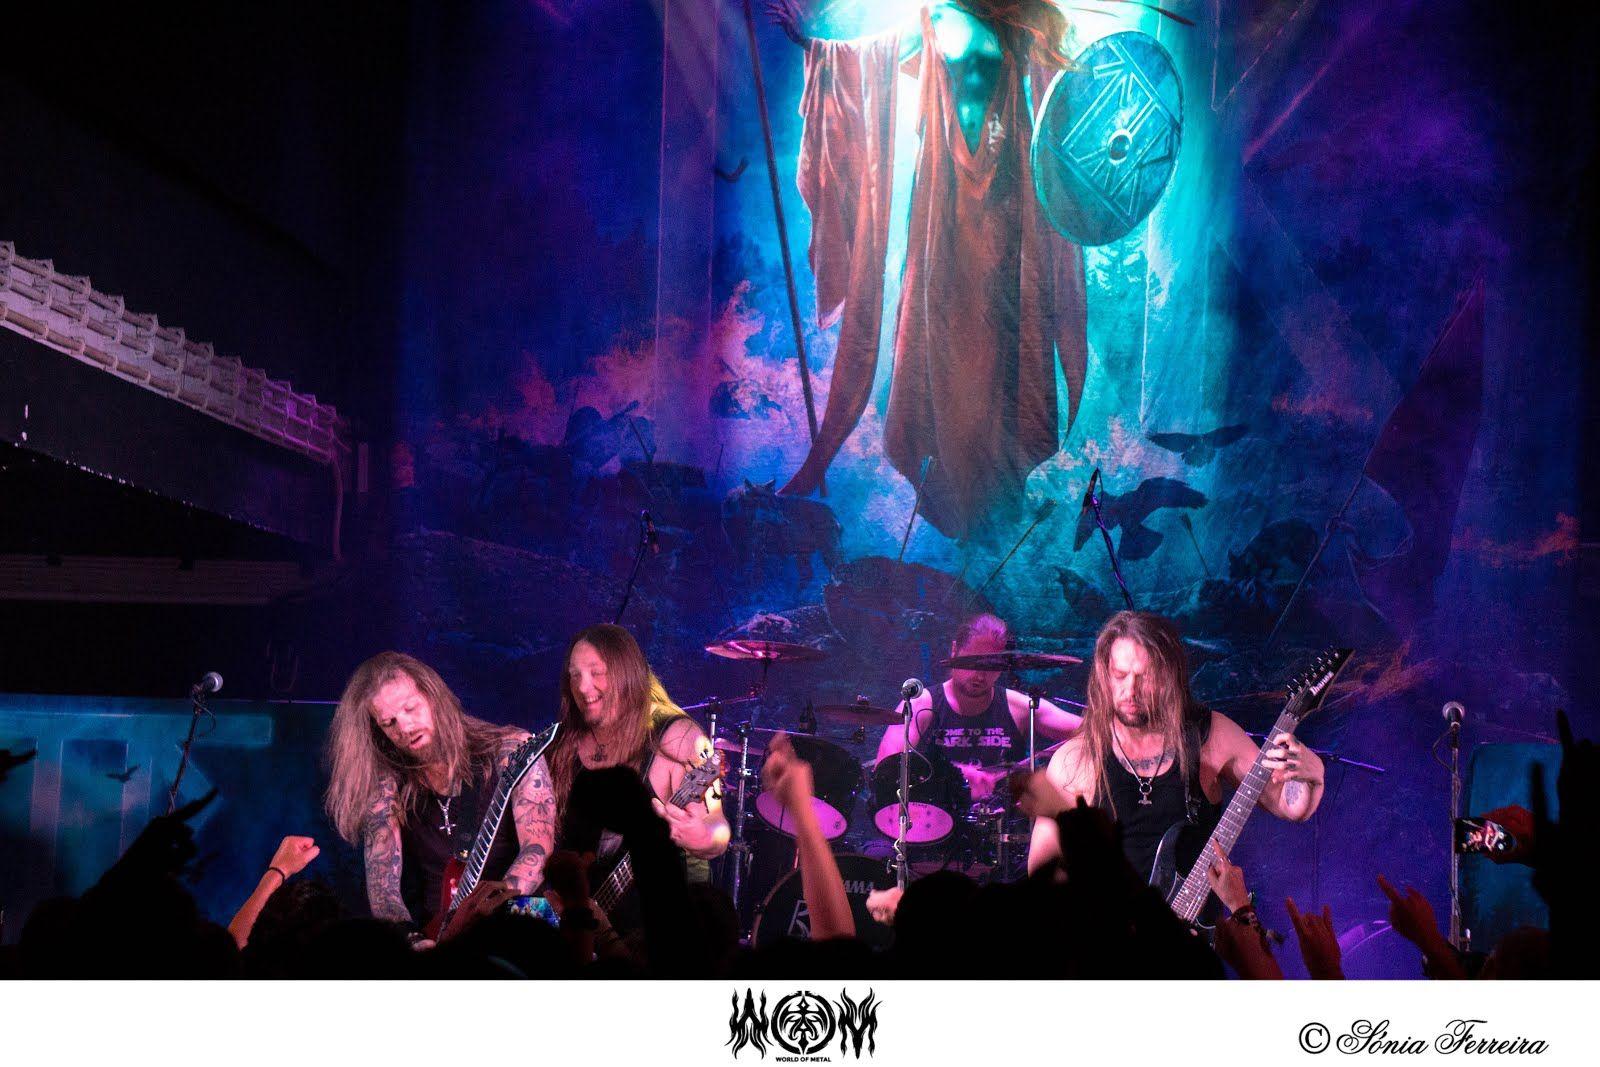 Fotorreportagem Týr @ 25/09/16 - RCA Club, Lisboa - World Of Metal